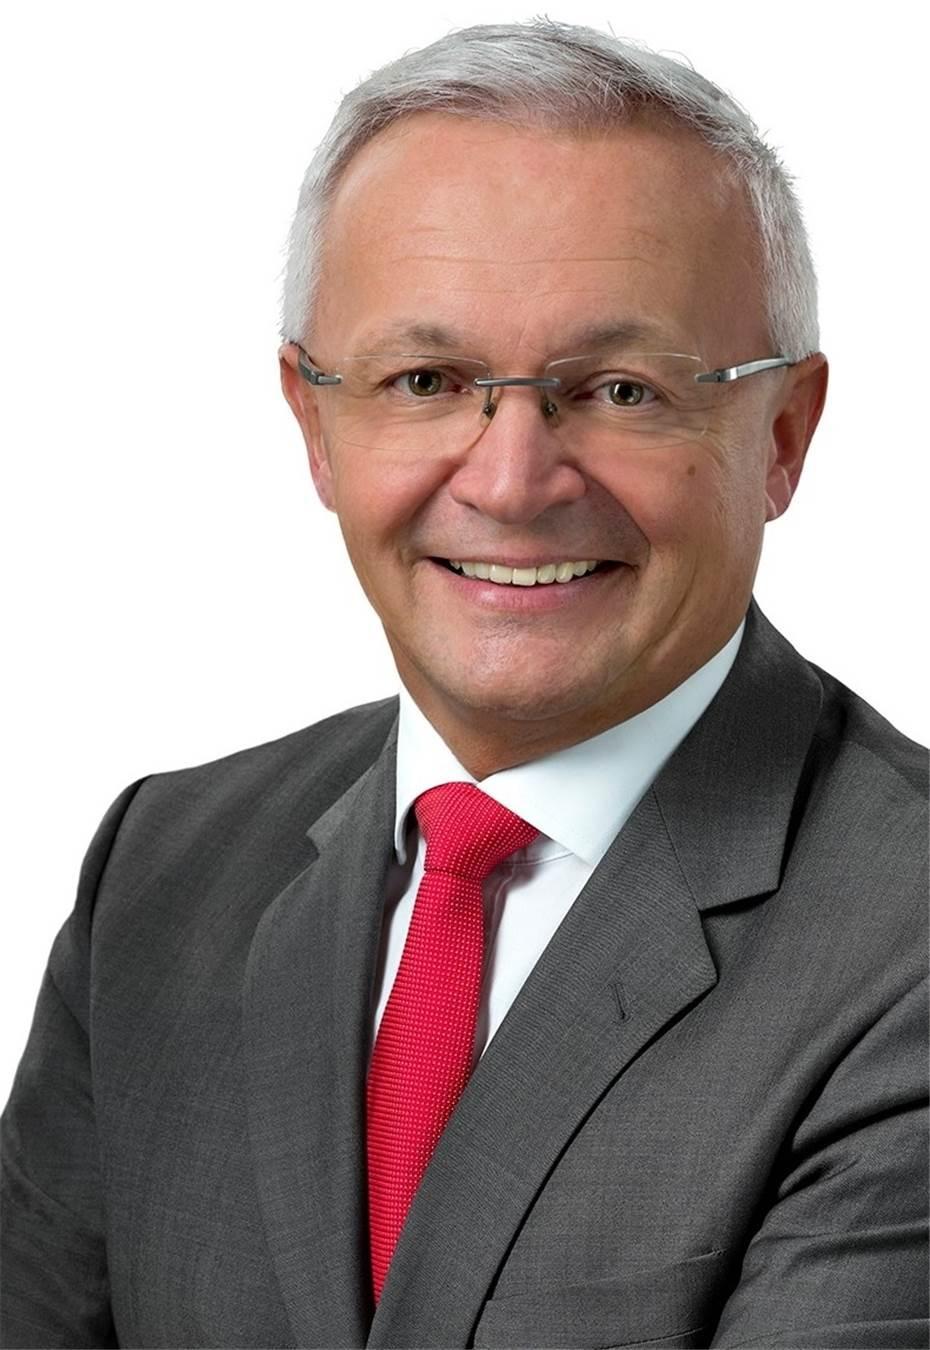 LR Hallerbach